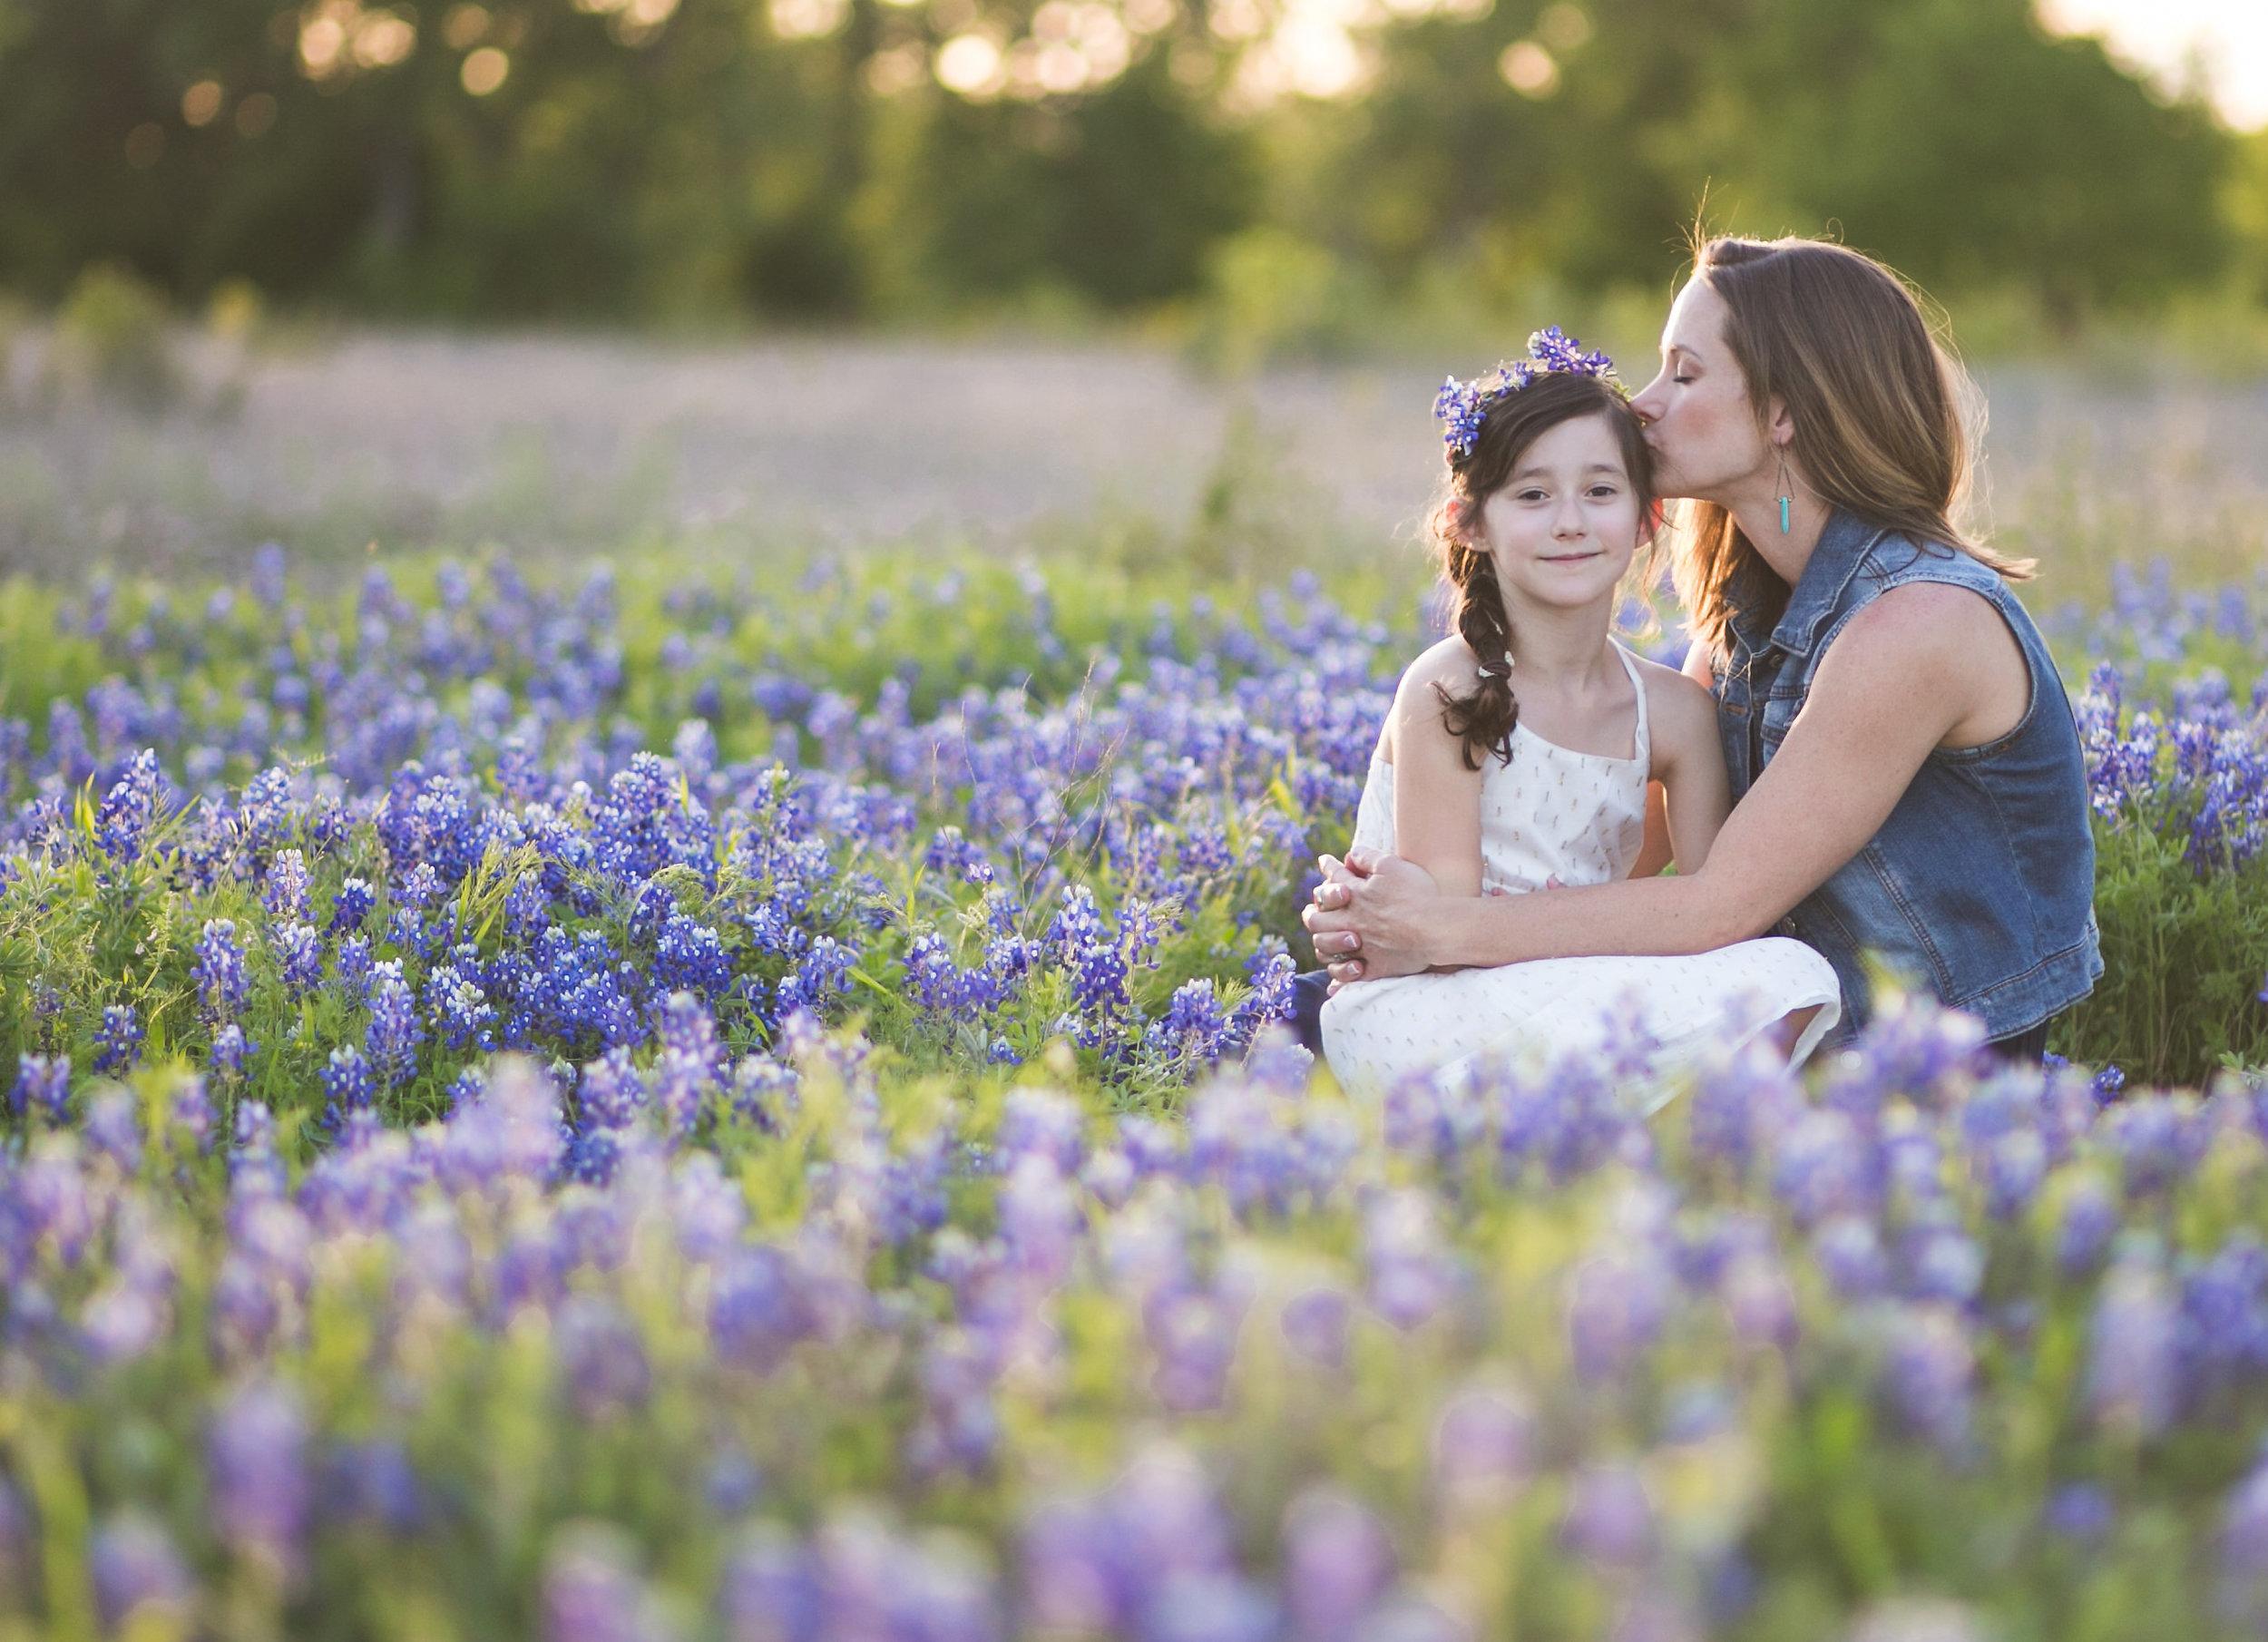 mommy&me2016-4959.jpg